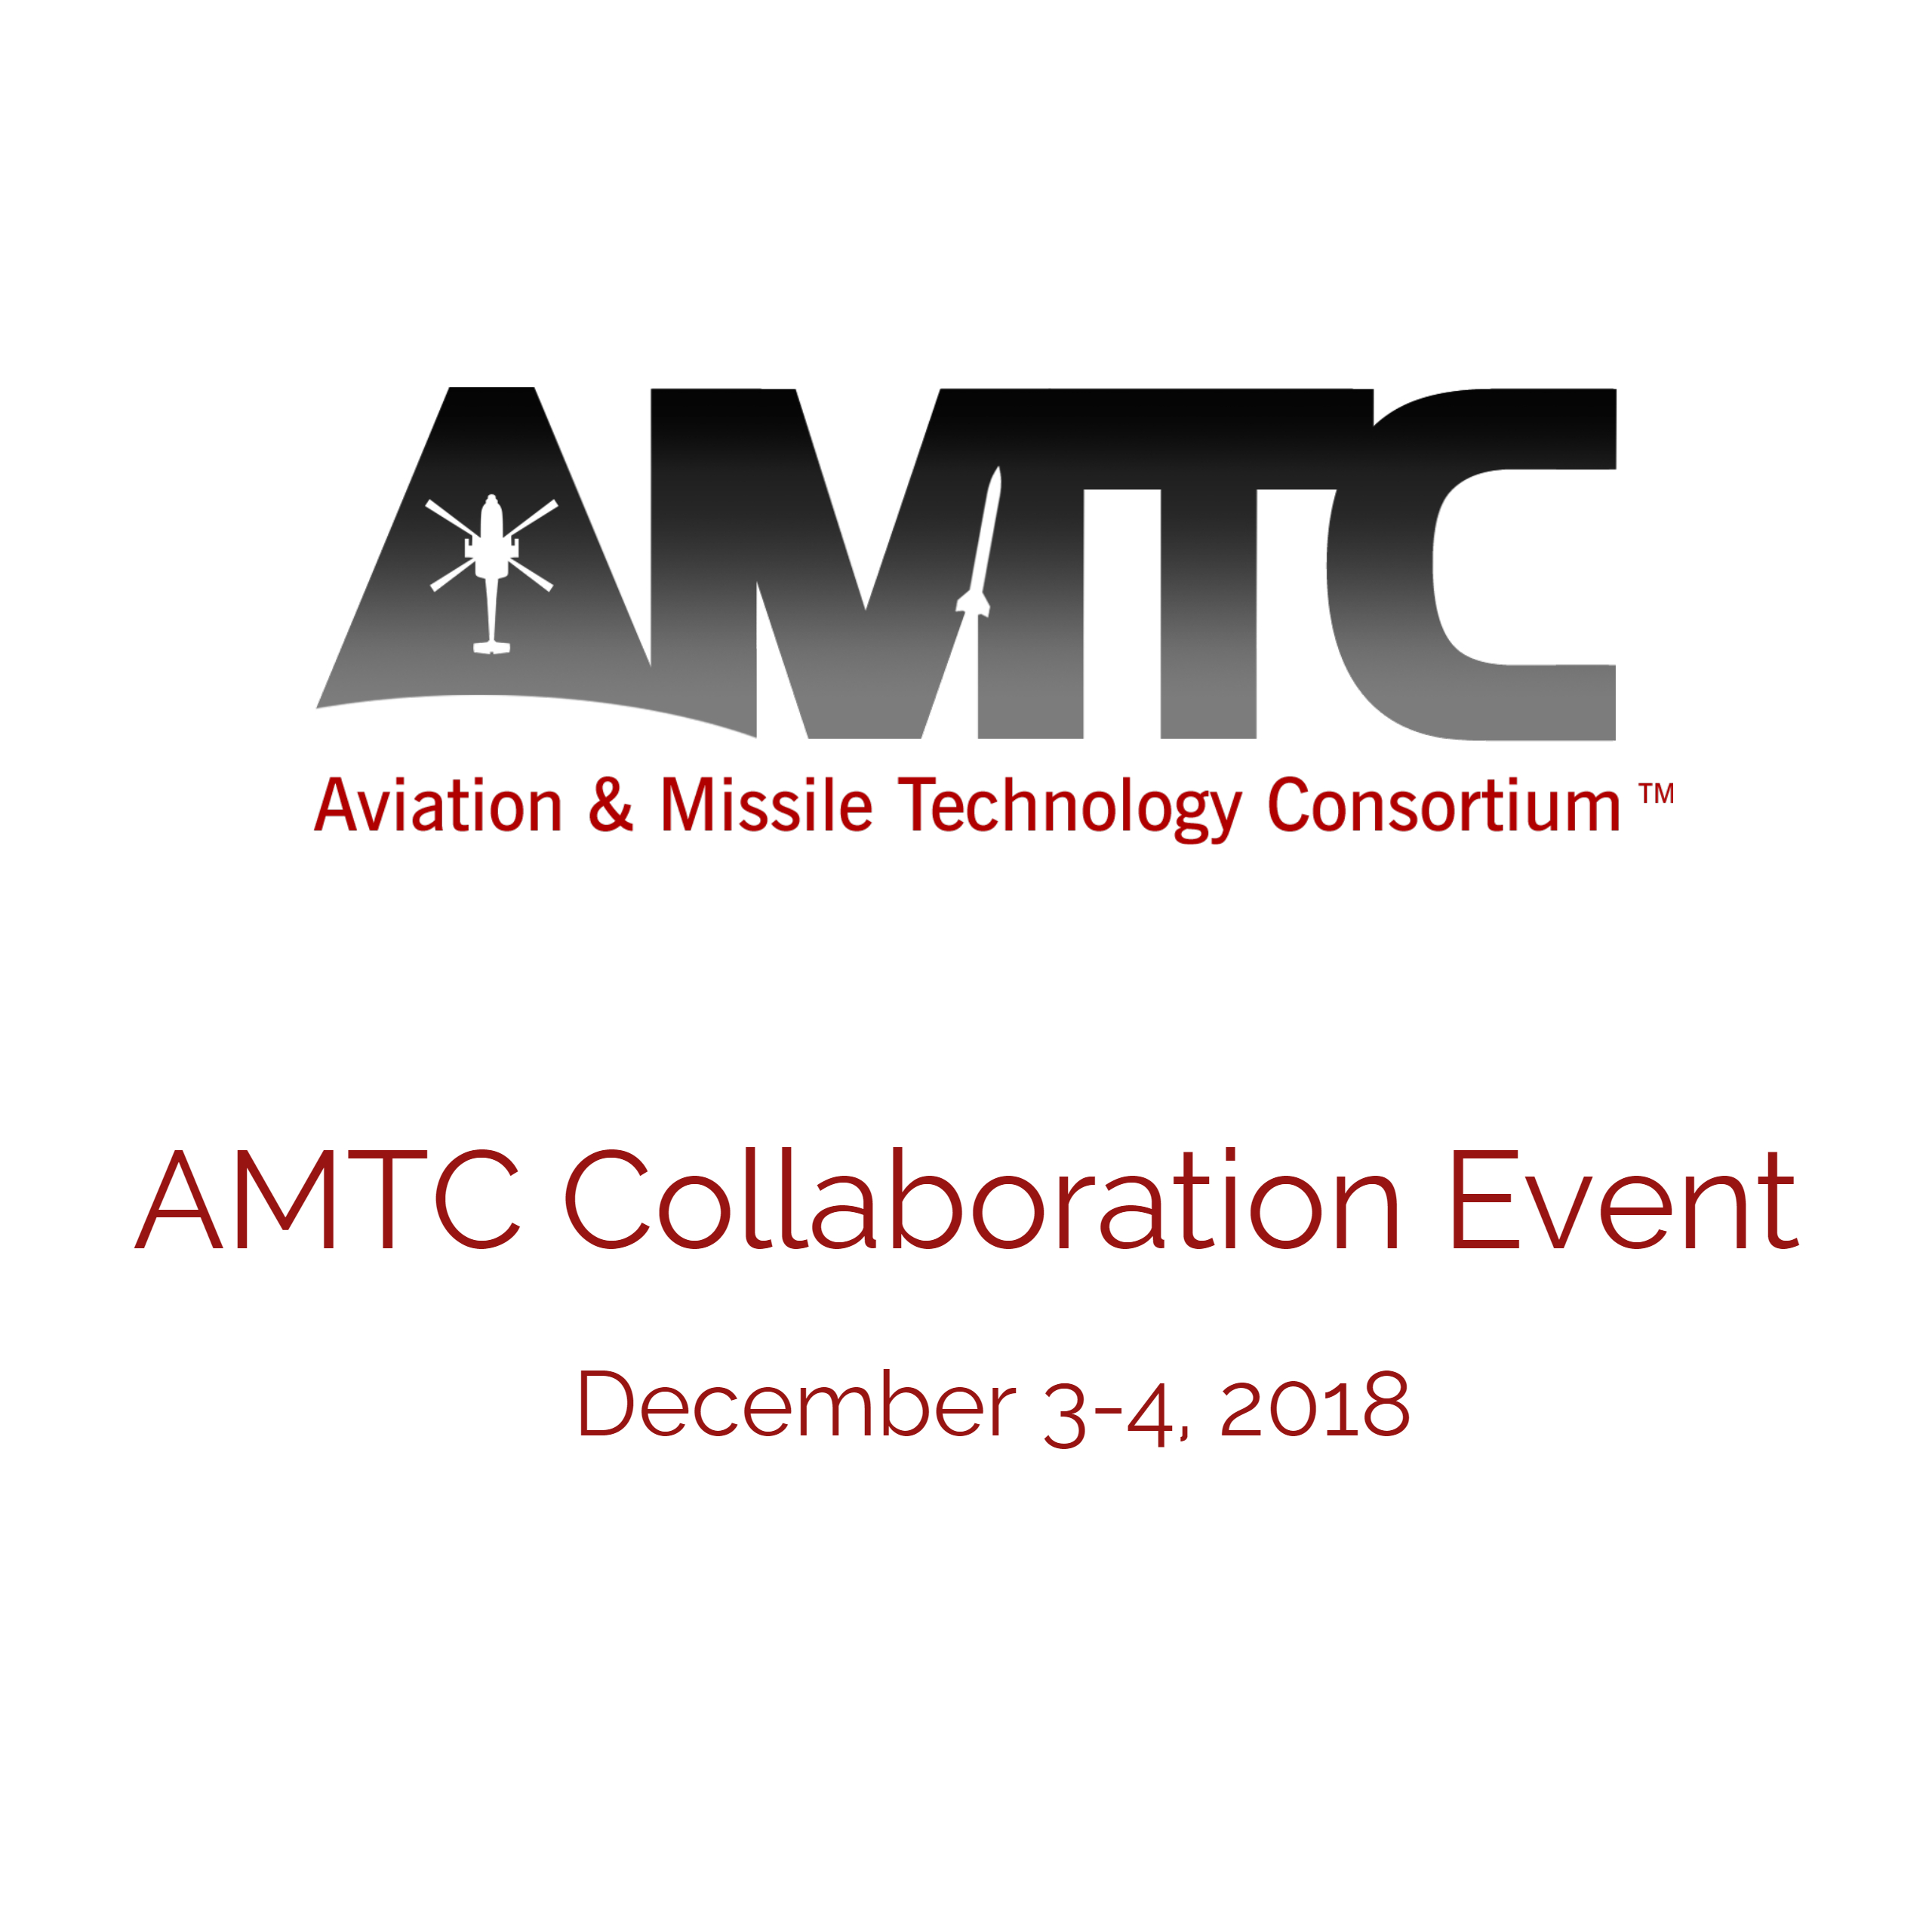 AMTC Collaboration Event: December 3-5, 2018